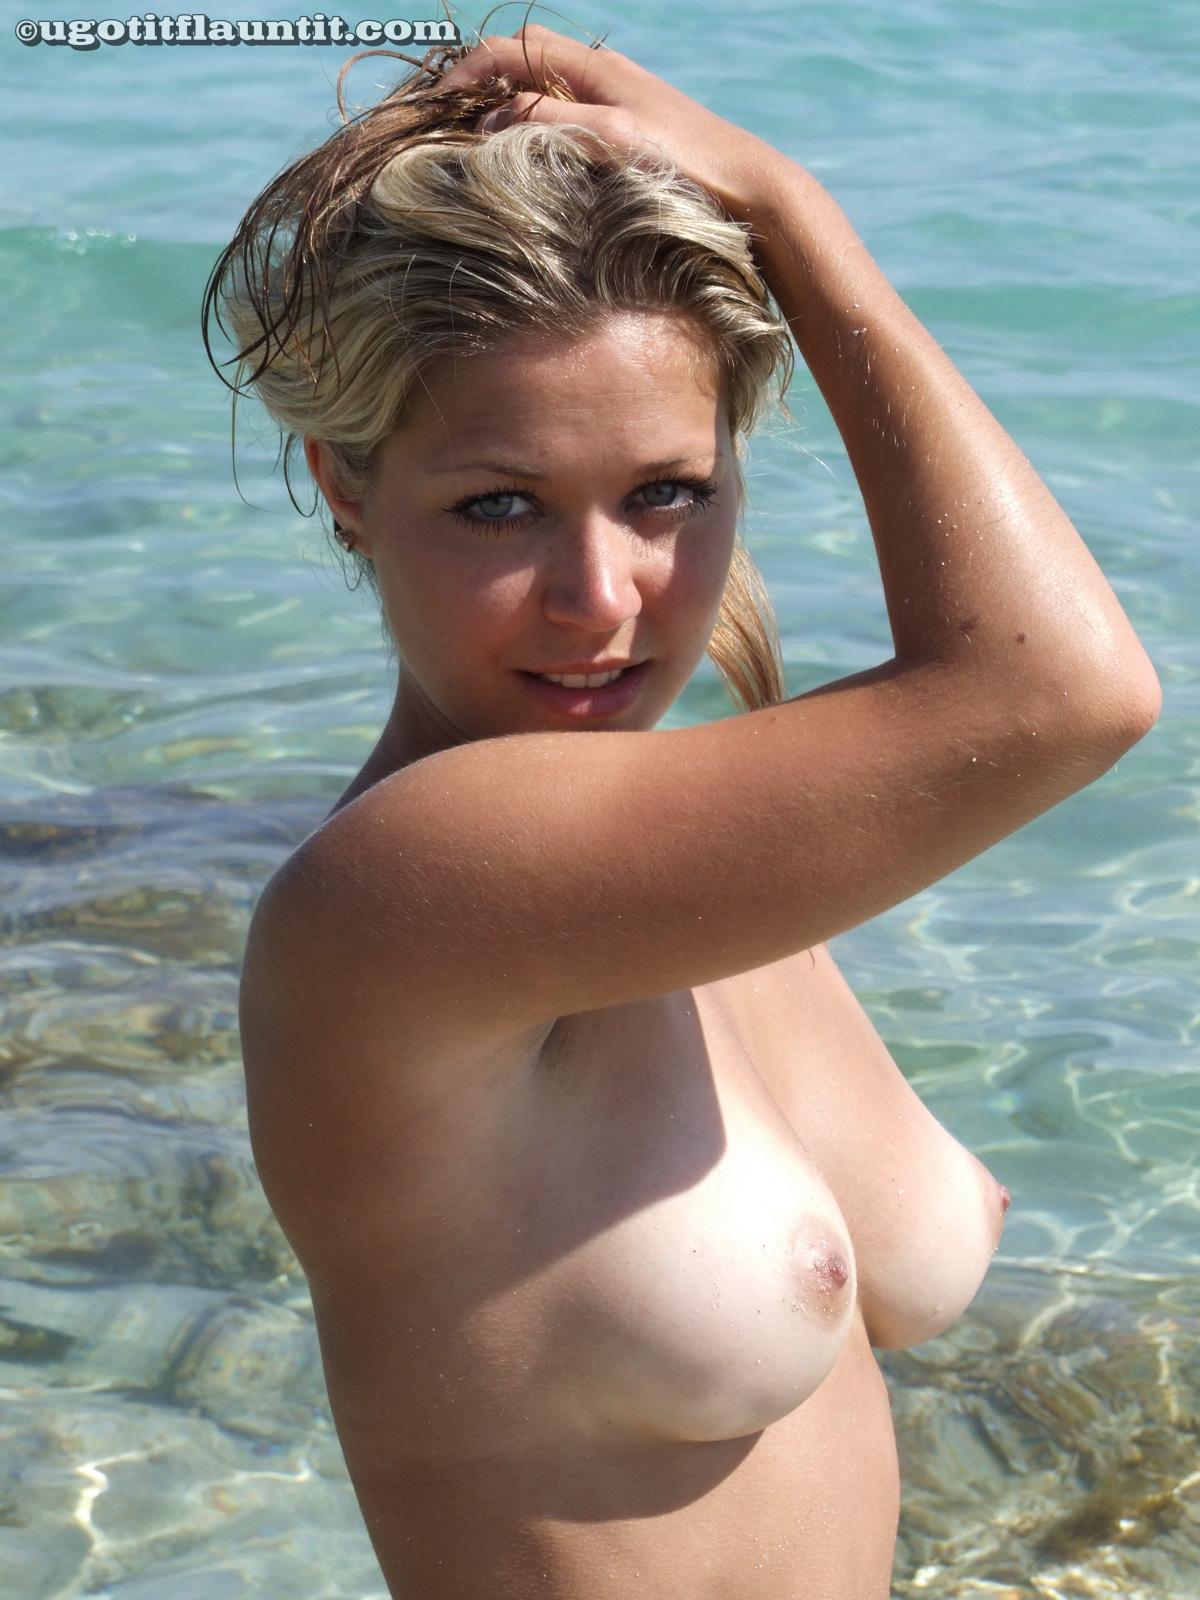 Topless bikini beach